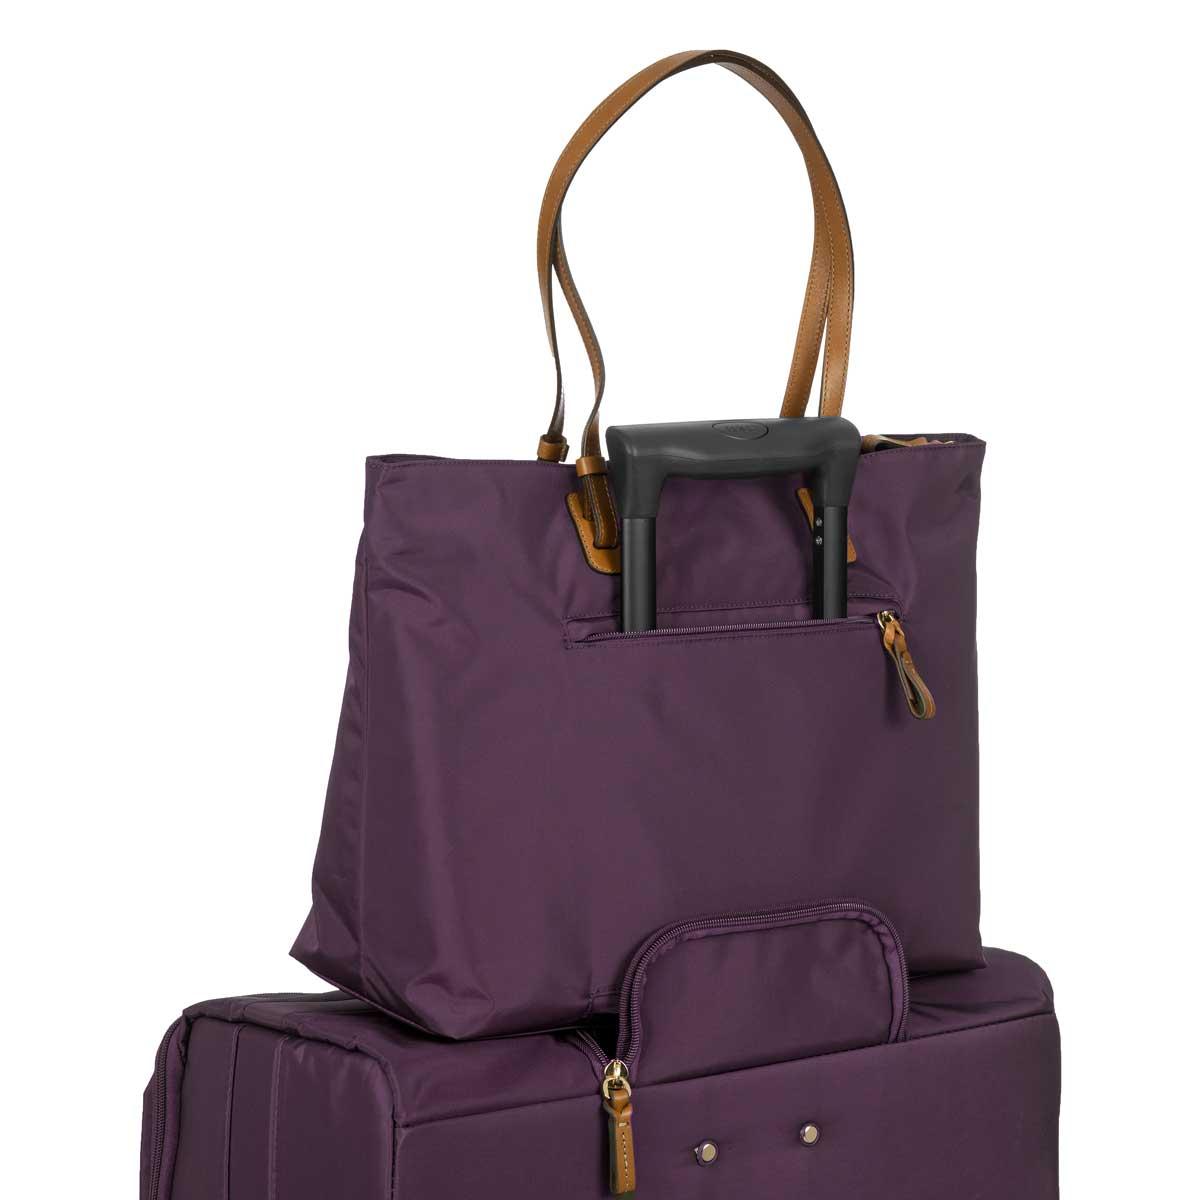 8524a54268c5 X-Bag Women's Business Tote Bag - Purple